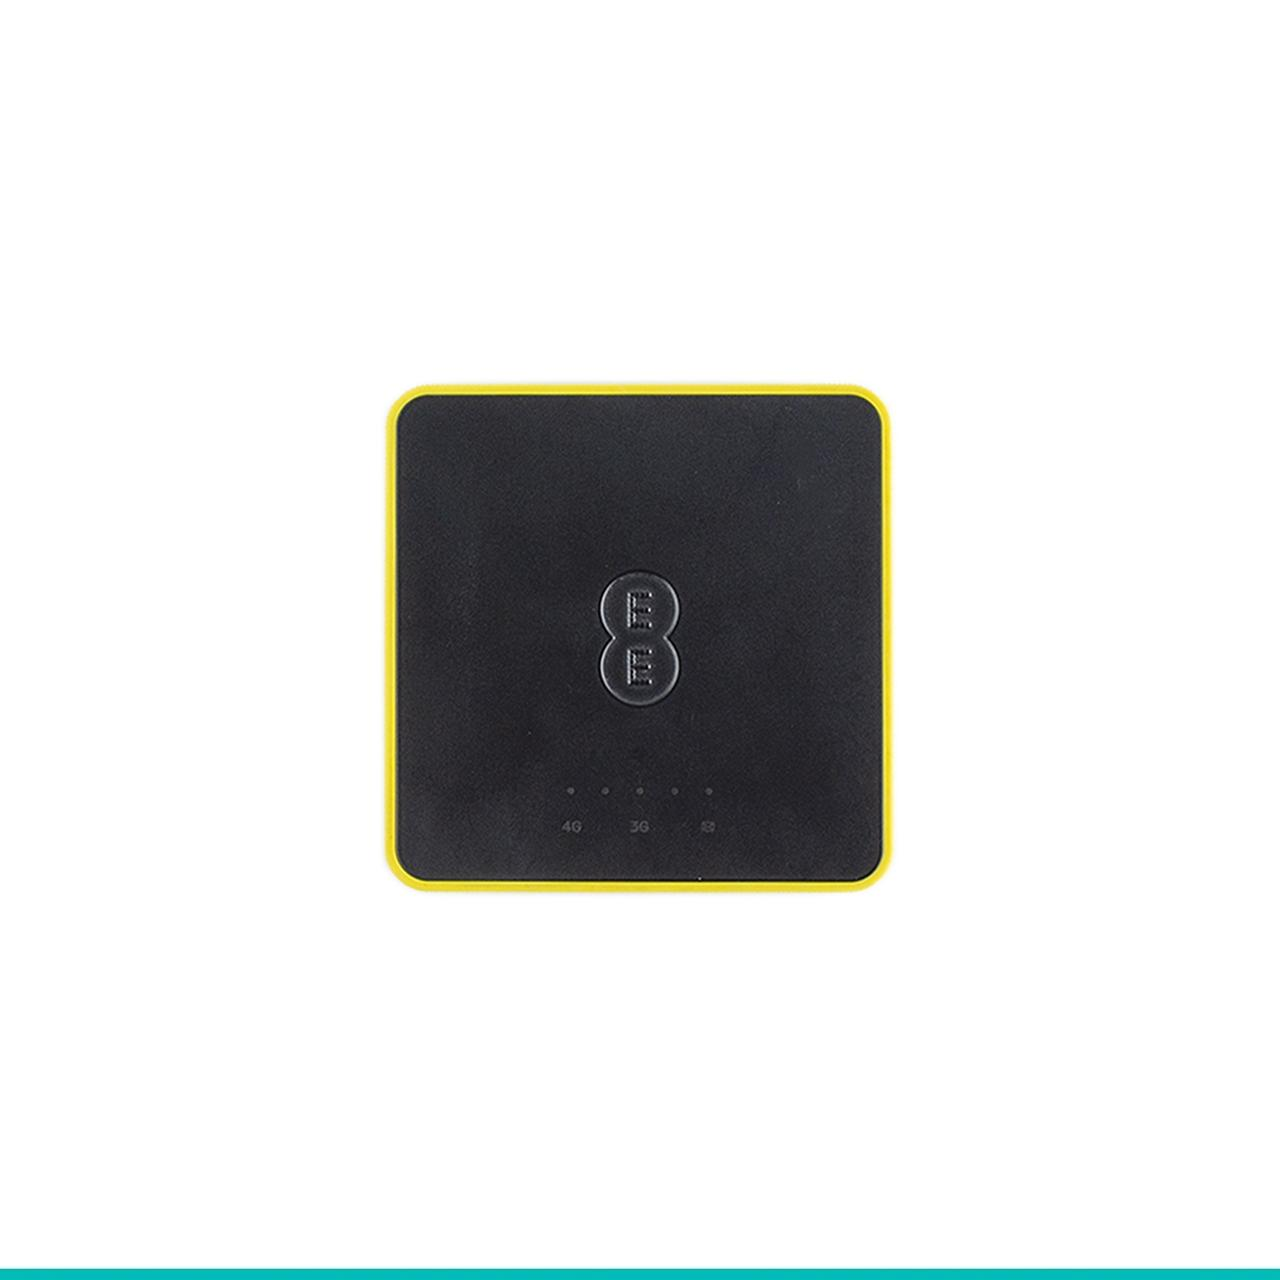 3G/4G WiFi роутер Alcatel Y854 (Киевстар, Vodafone, Lifecell) Уценка, фото 1